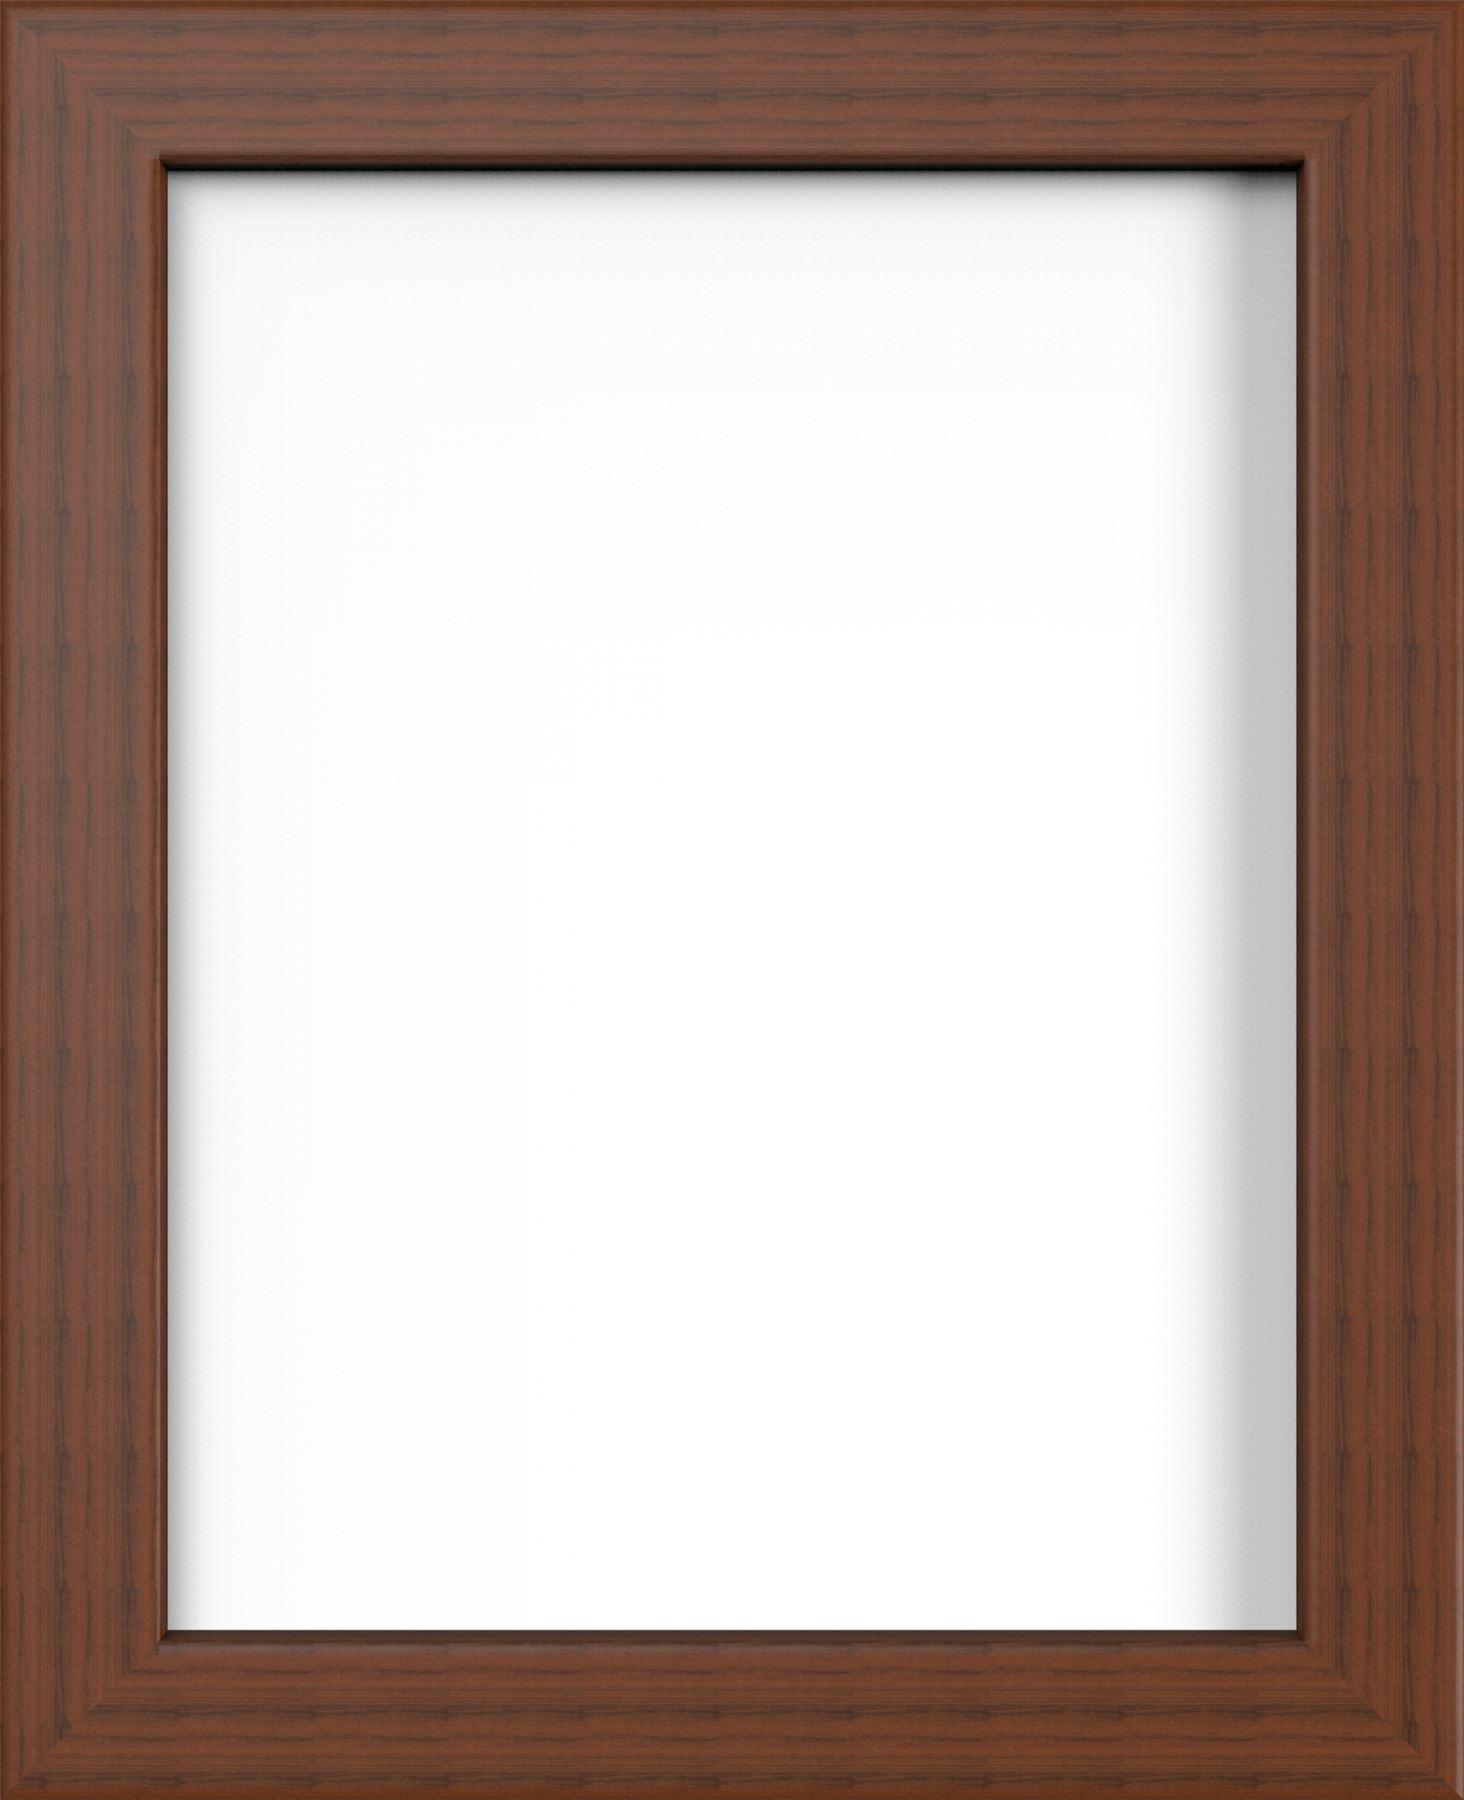 Poster frames 28x40